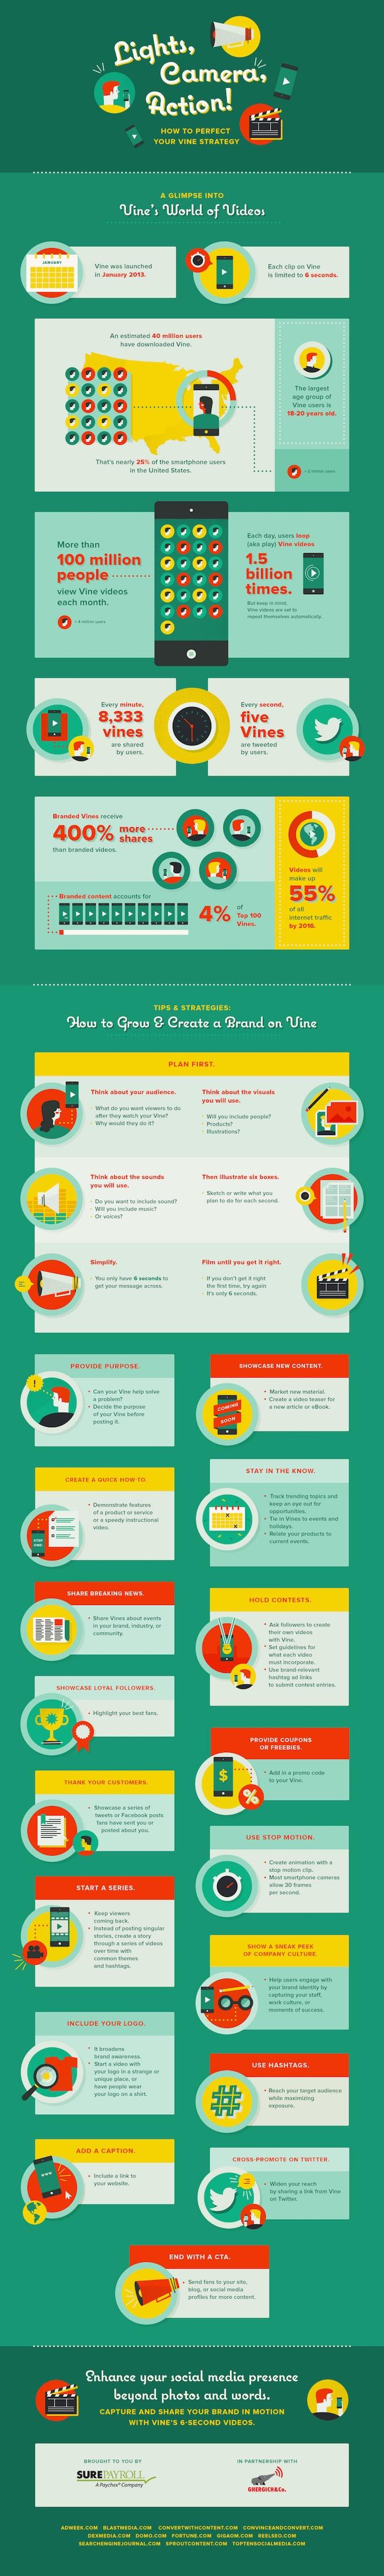 vine-strategy-infographic.jpg